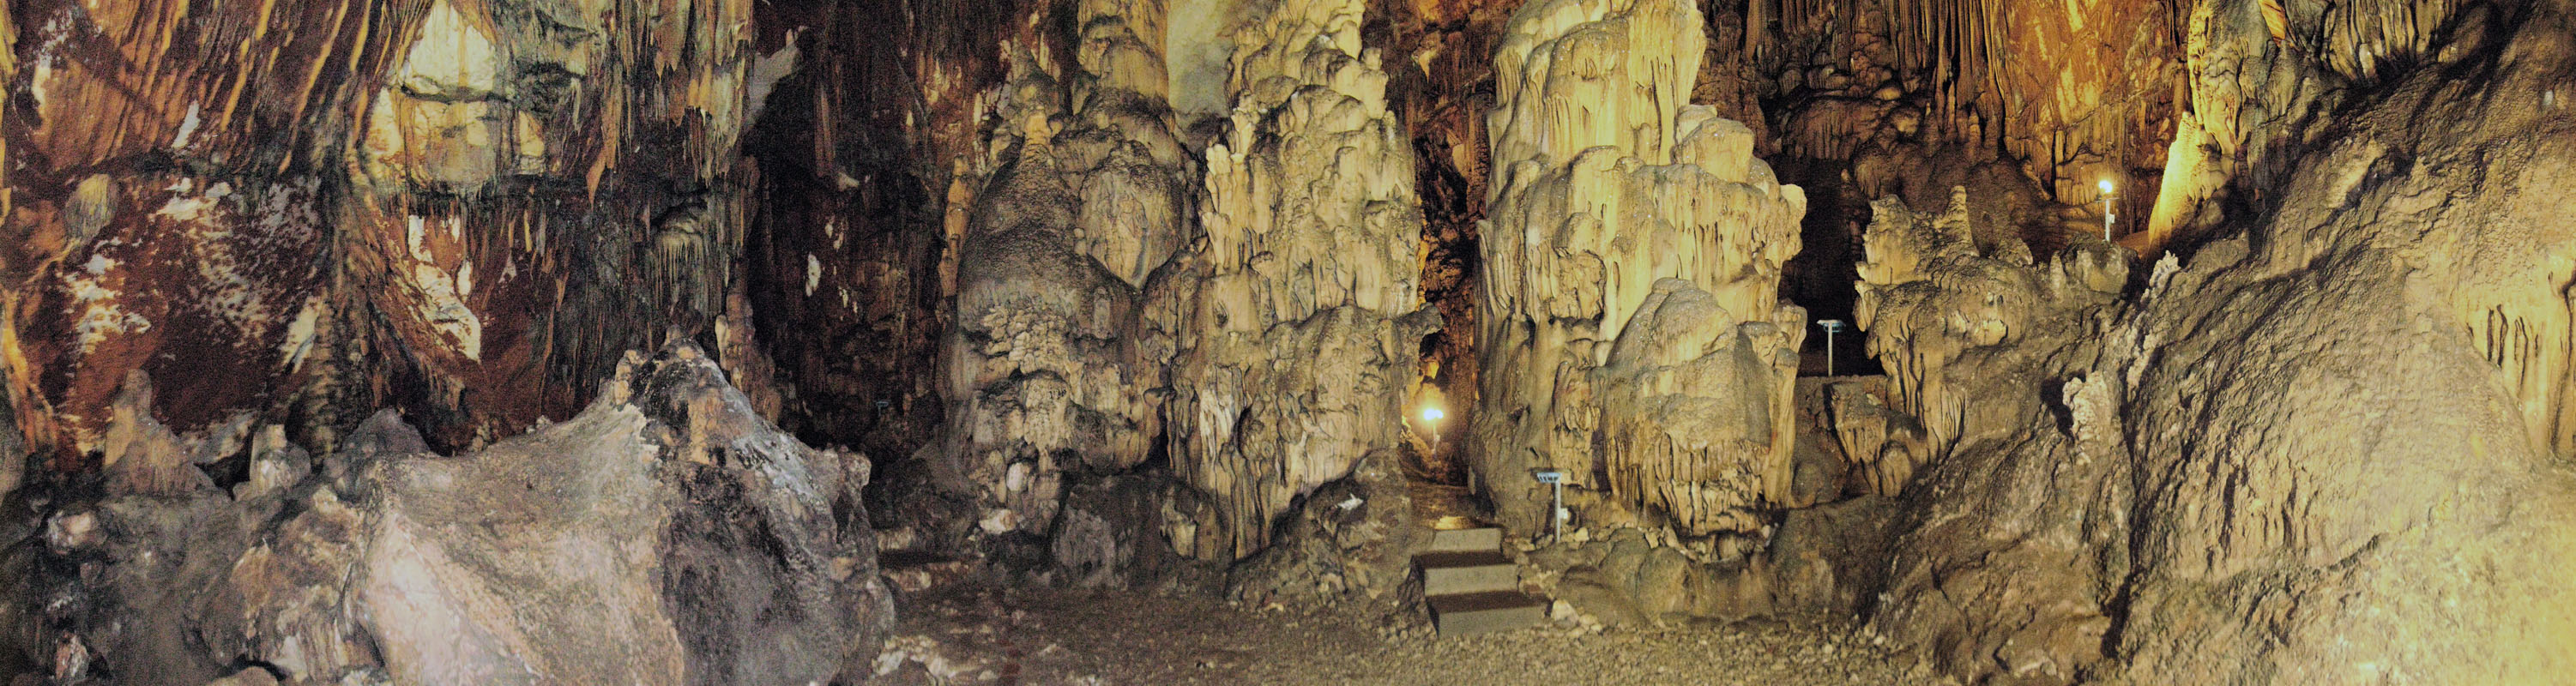 Vranjaca cave (9)